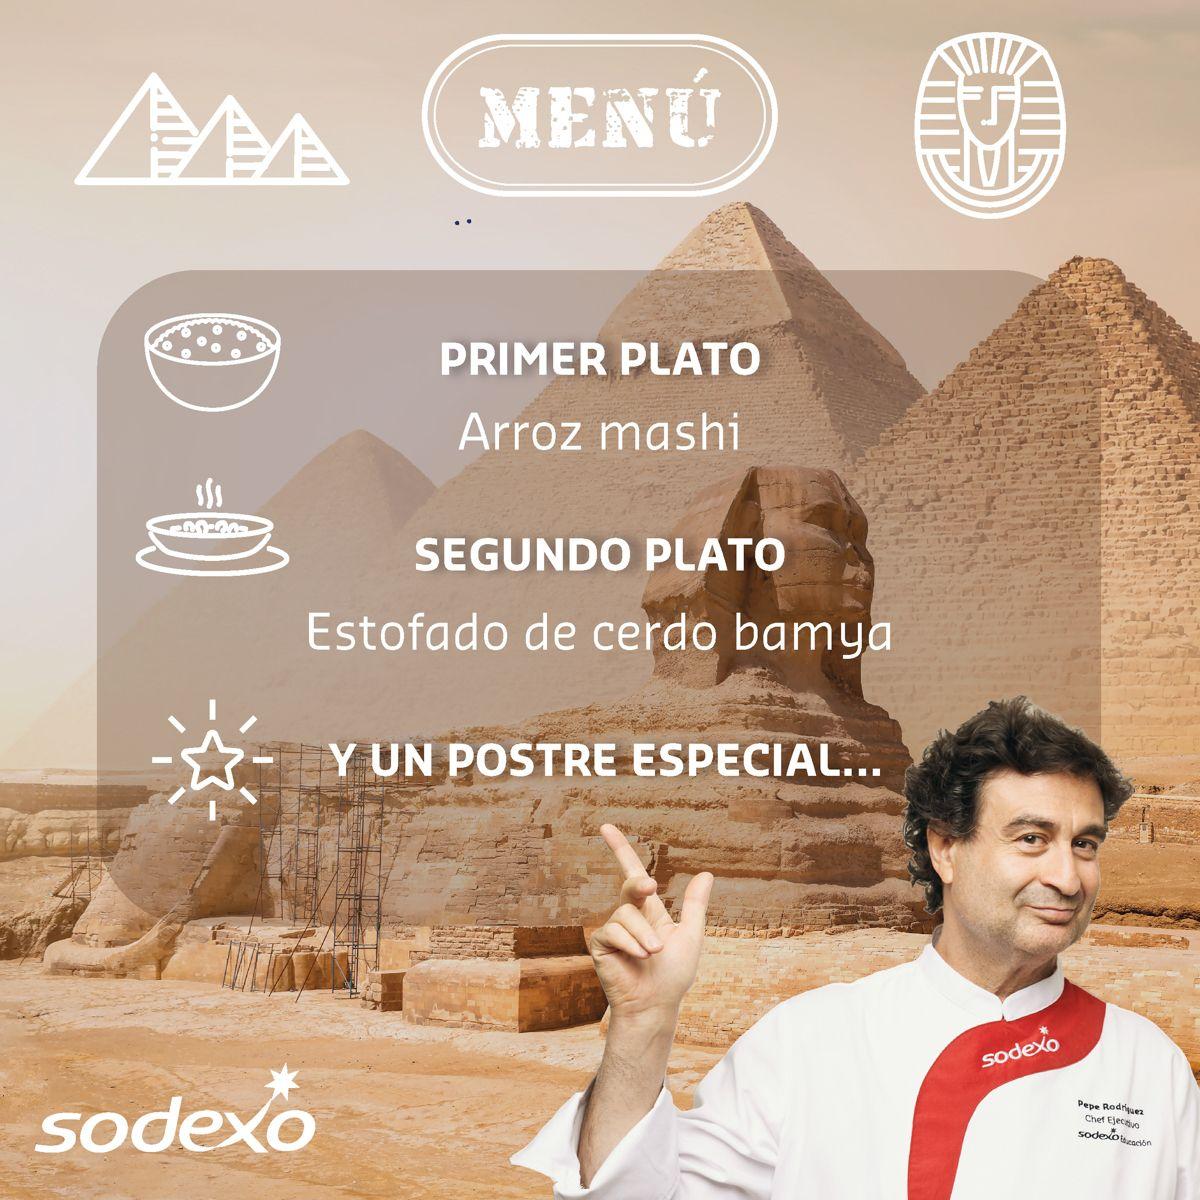 jornada-gastronomica-egipto